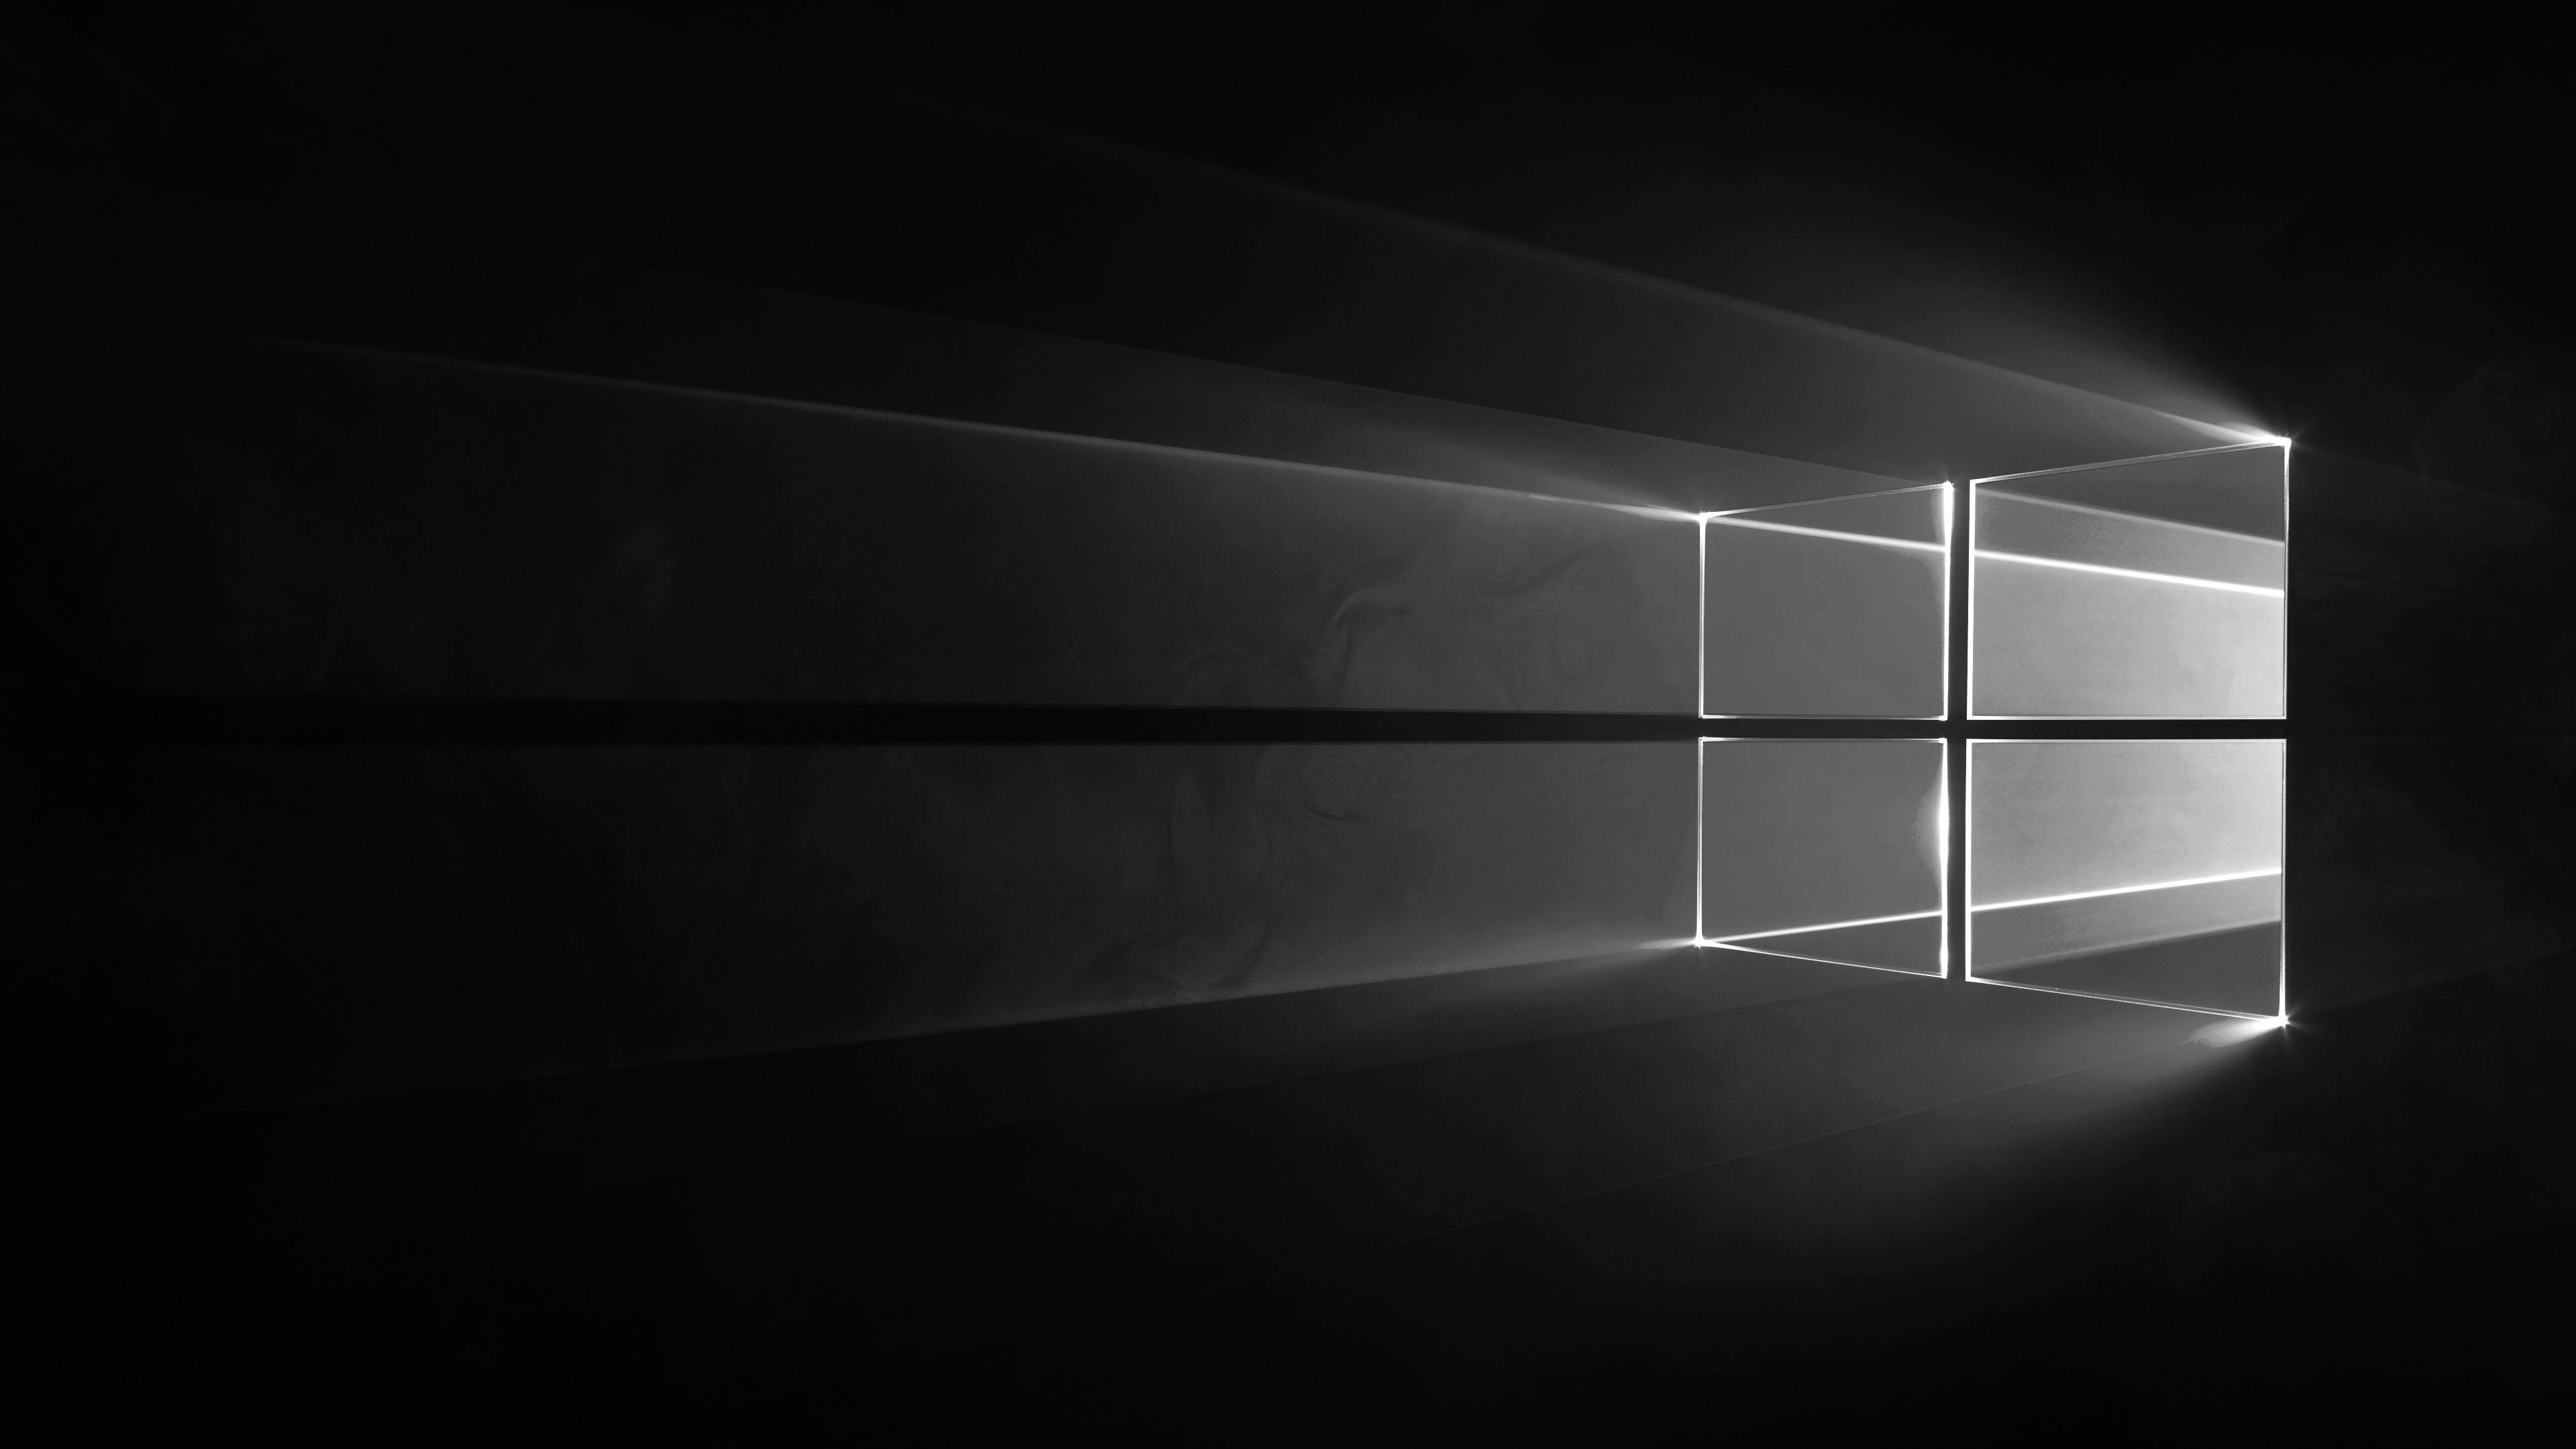 Wallpaper World Windows 10 Dark Theme Wallpaper 4k